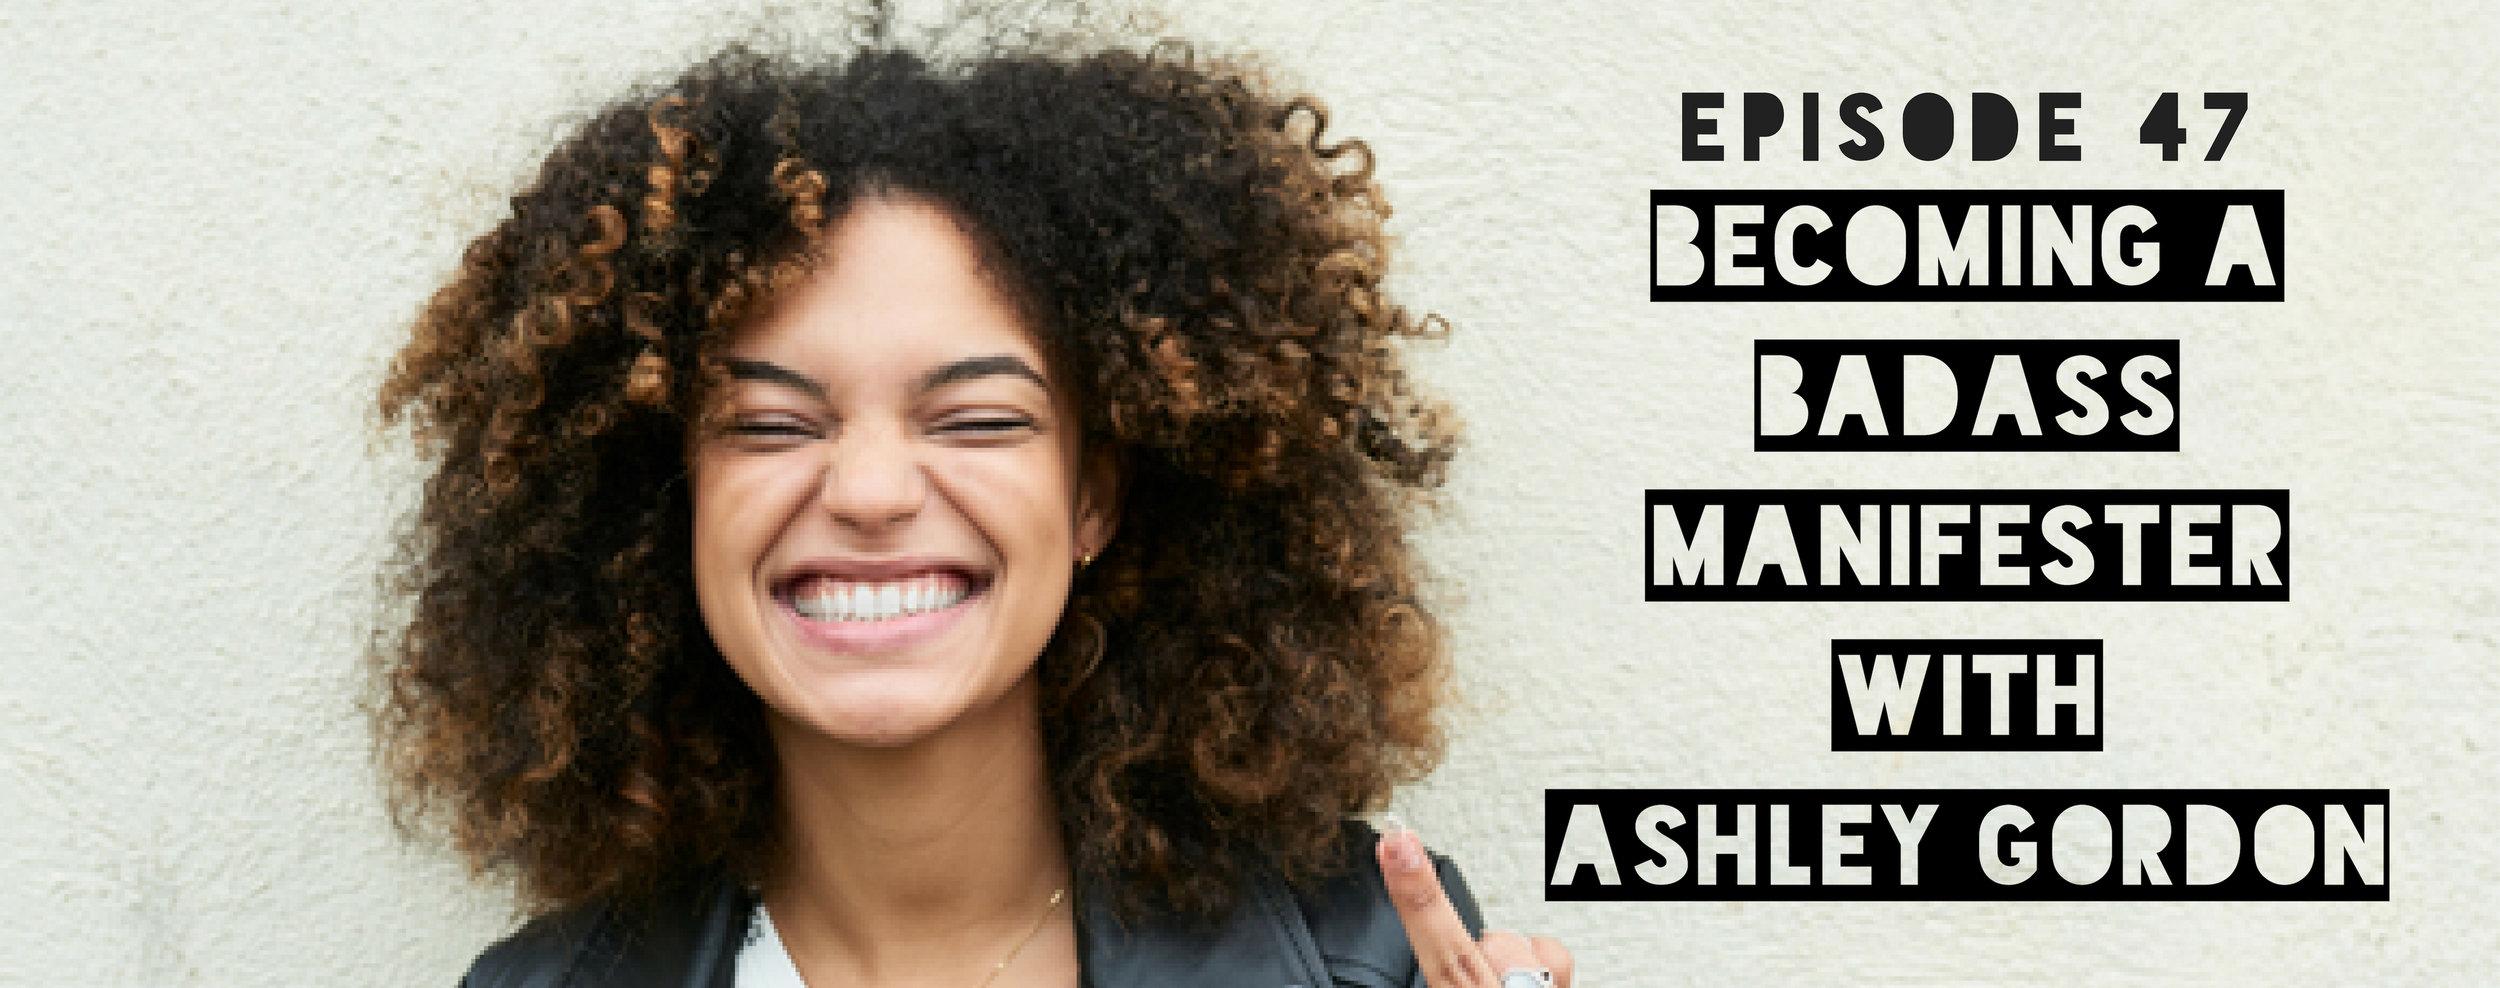 MFTP Episode 47: Becoming a Badass Manifester with Ashley Gordon